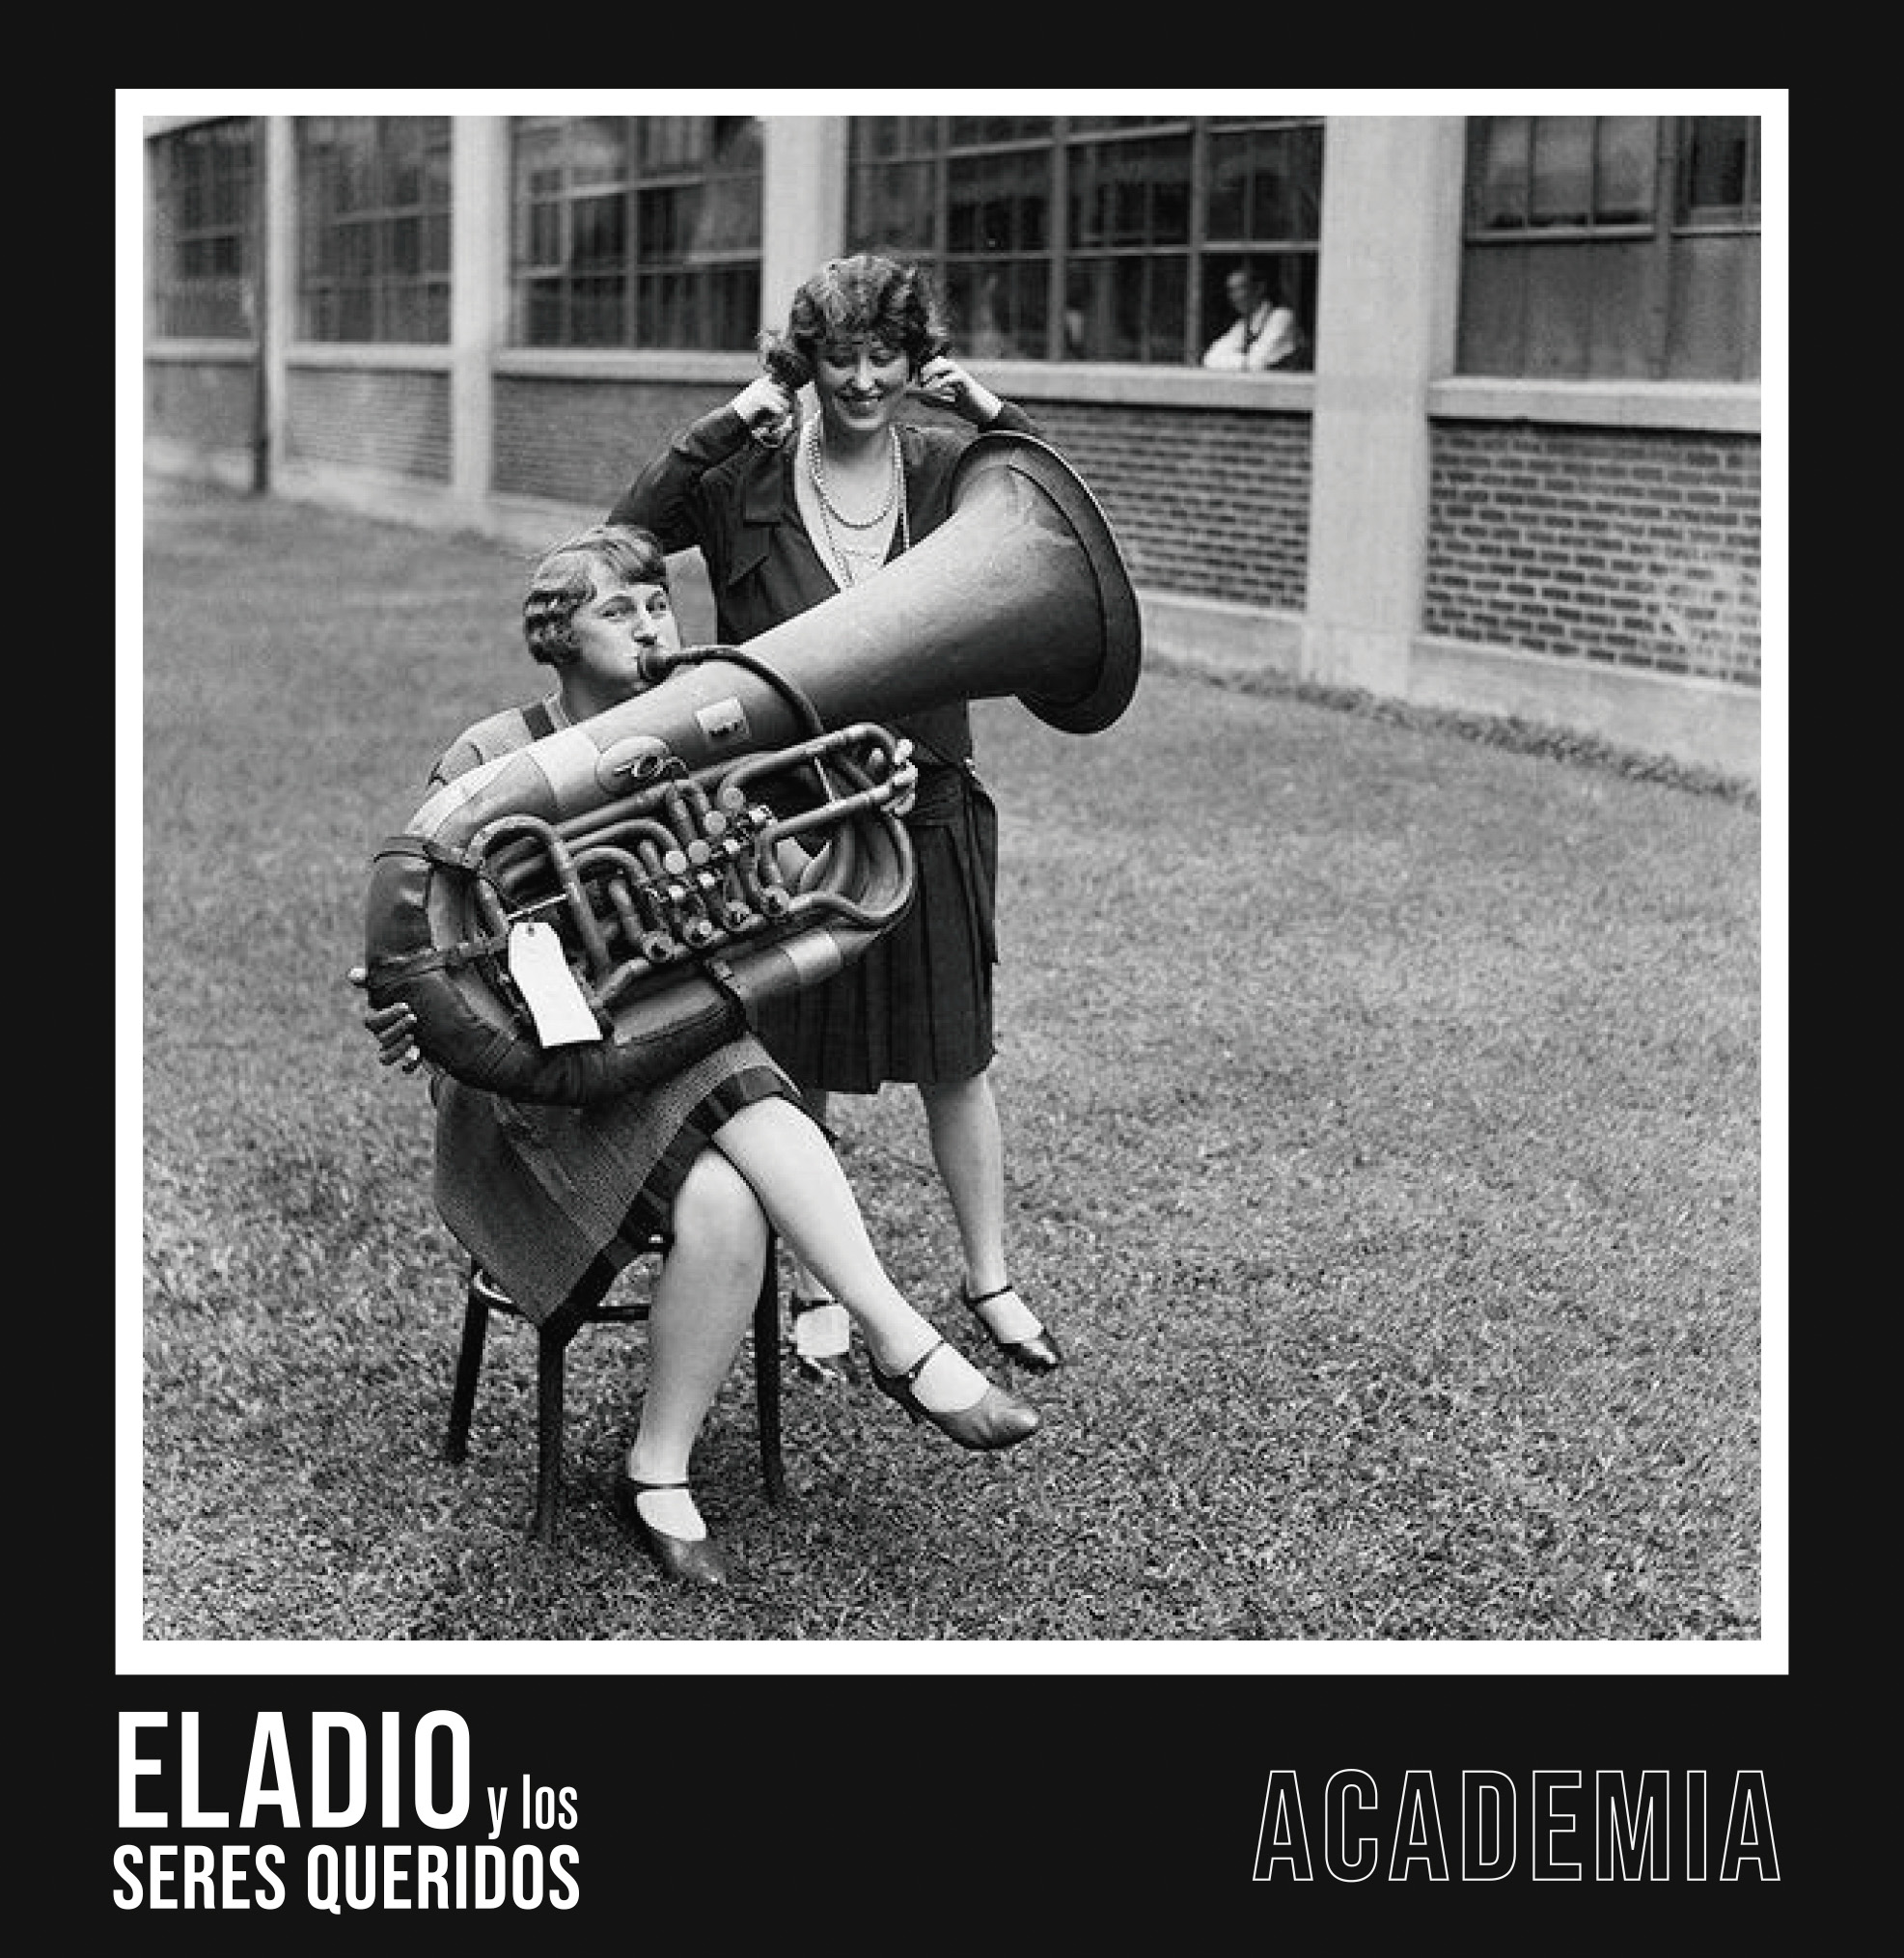 Eladio y los Seres Queridos presentan 'Academia', o seu sexto disco